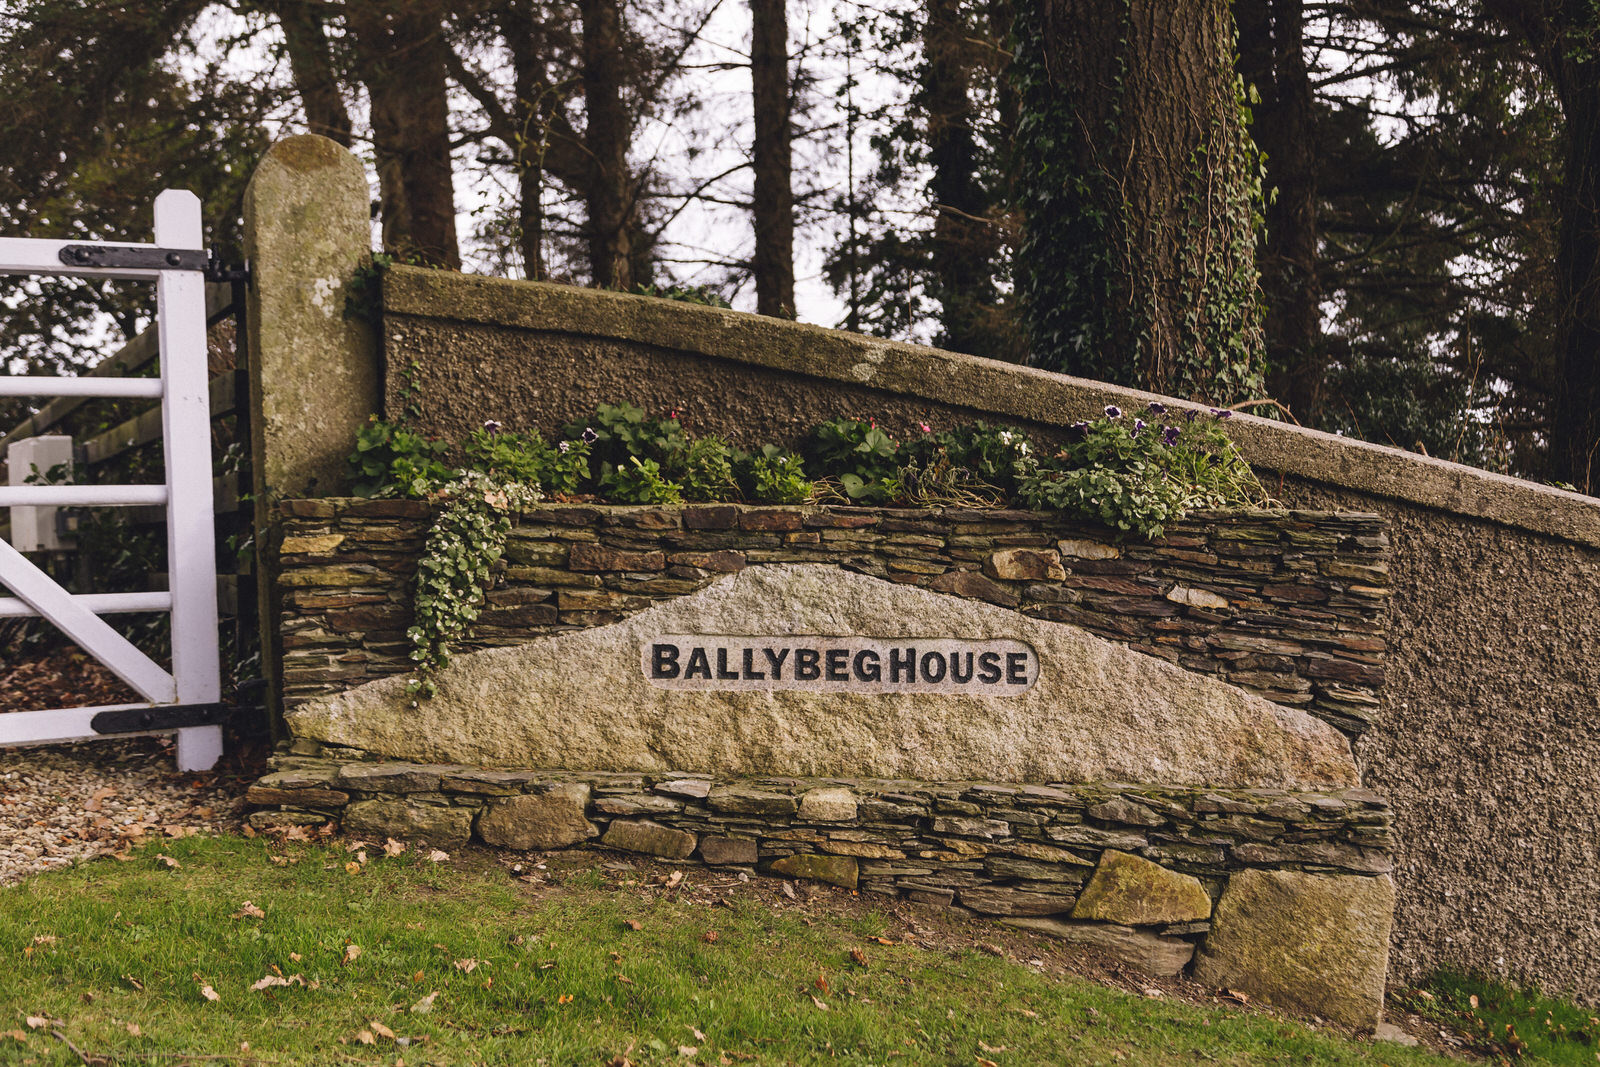 Balybeg-house-ireland-wicklow-wedding-photographer-roger-kenny_greystones001.jpg